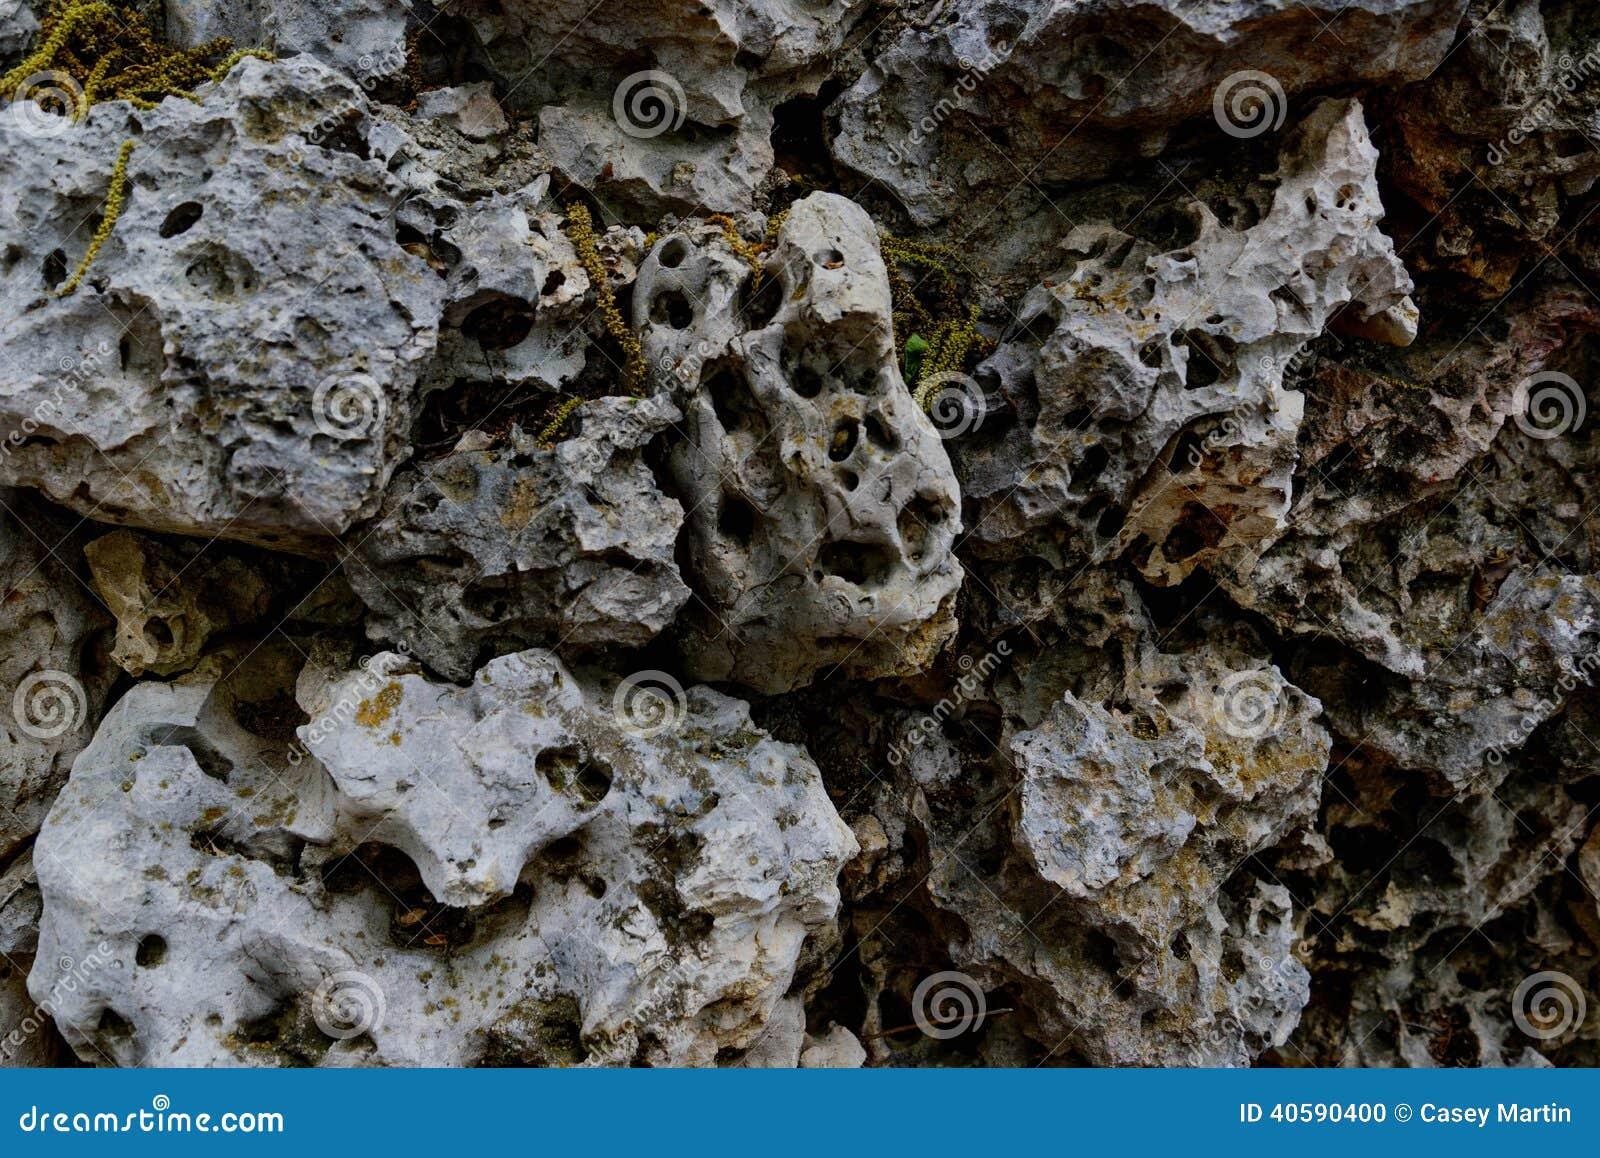 Lava Rock Stock Photo - Image: 40590400